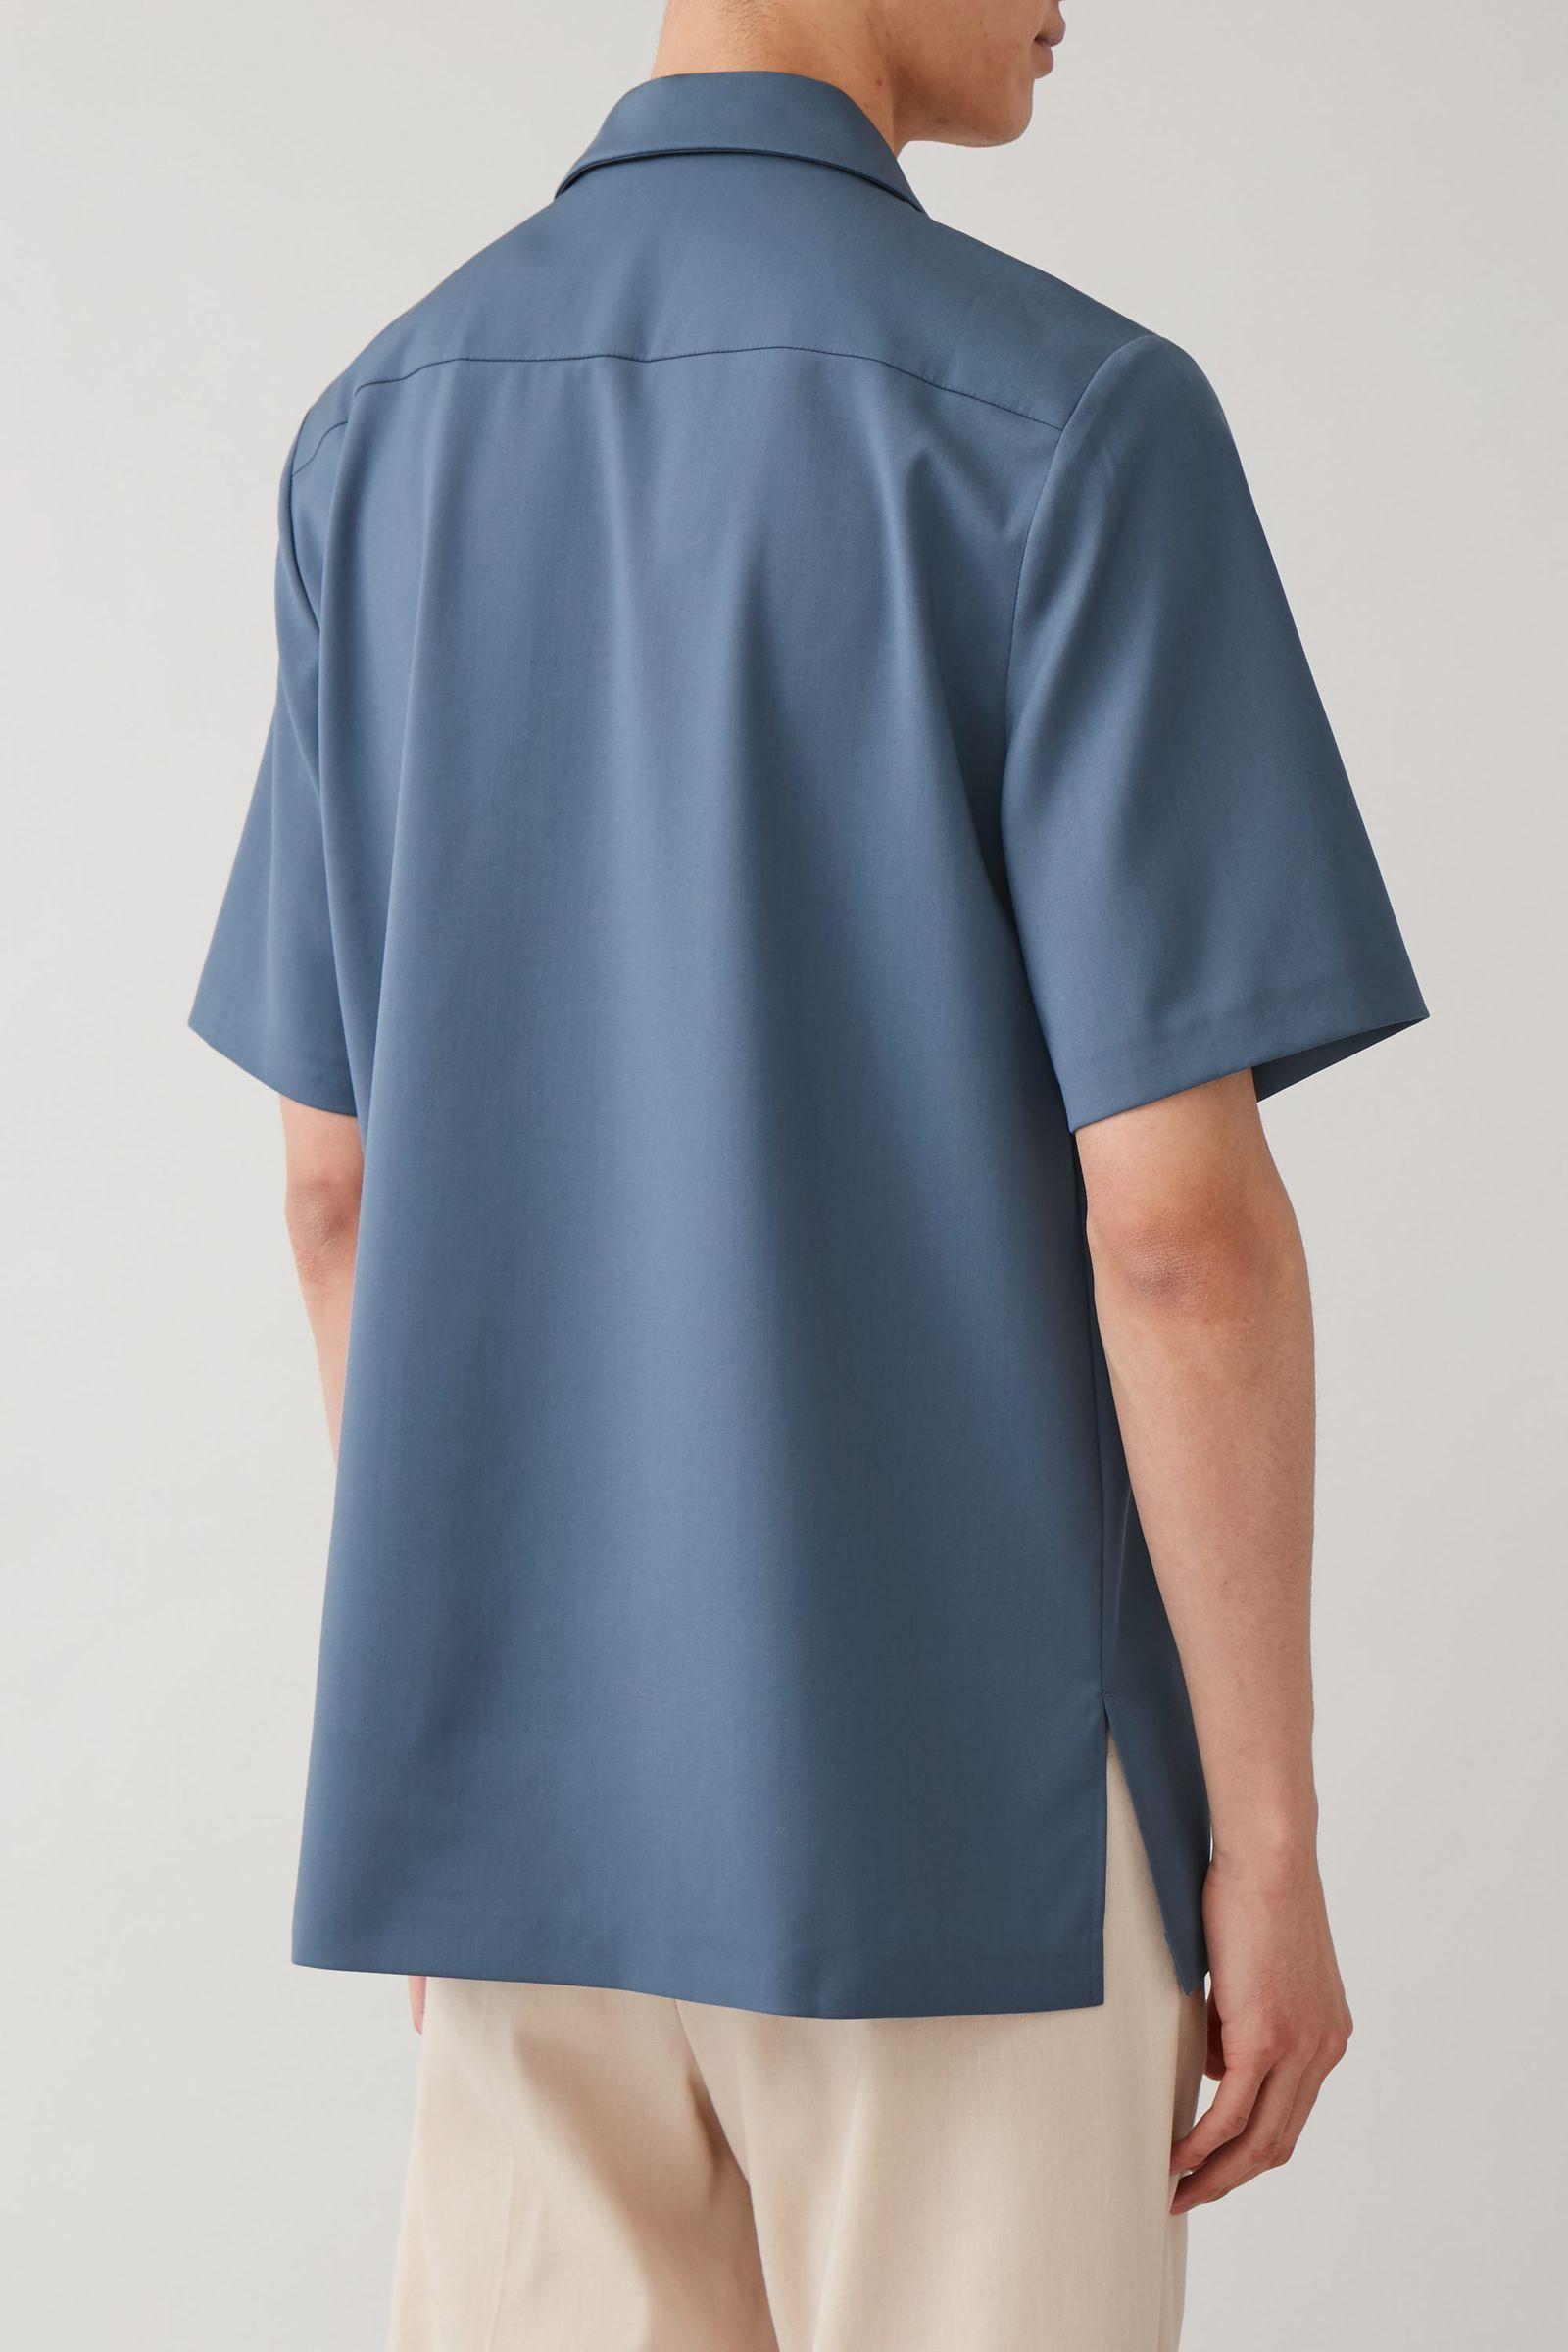 COS 캠프 칼라 울 셔츠의 스틸 블루컬러 ECOMLook입니다.